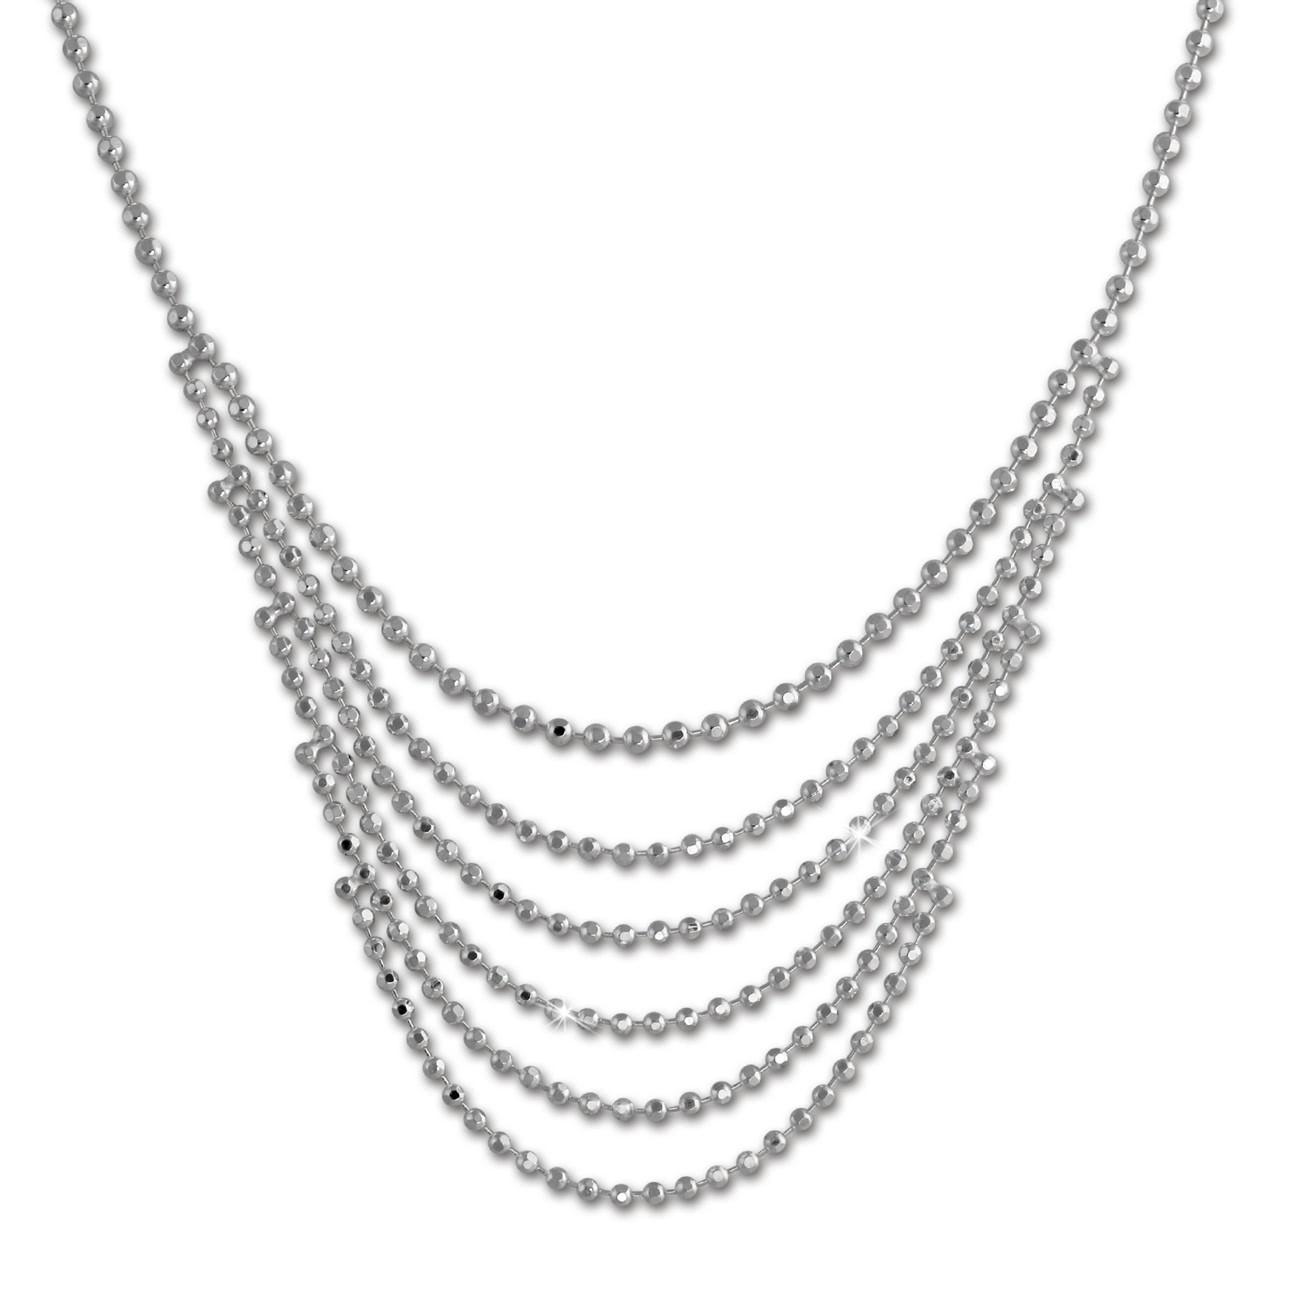 SilberDream Kugelcollier 925er Silber Halskette 42cm - 47cm Kette SDK27042J